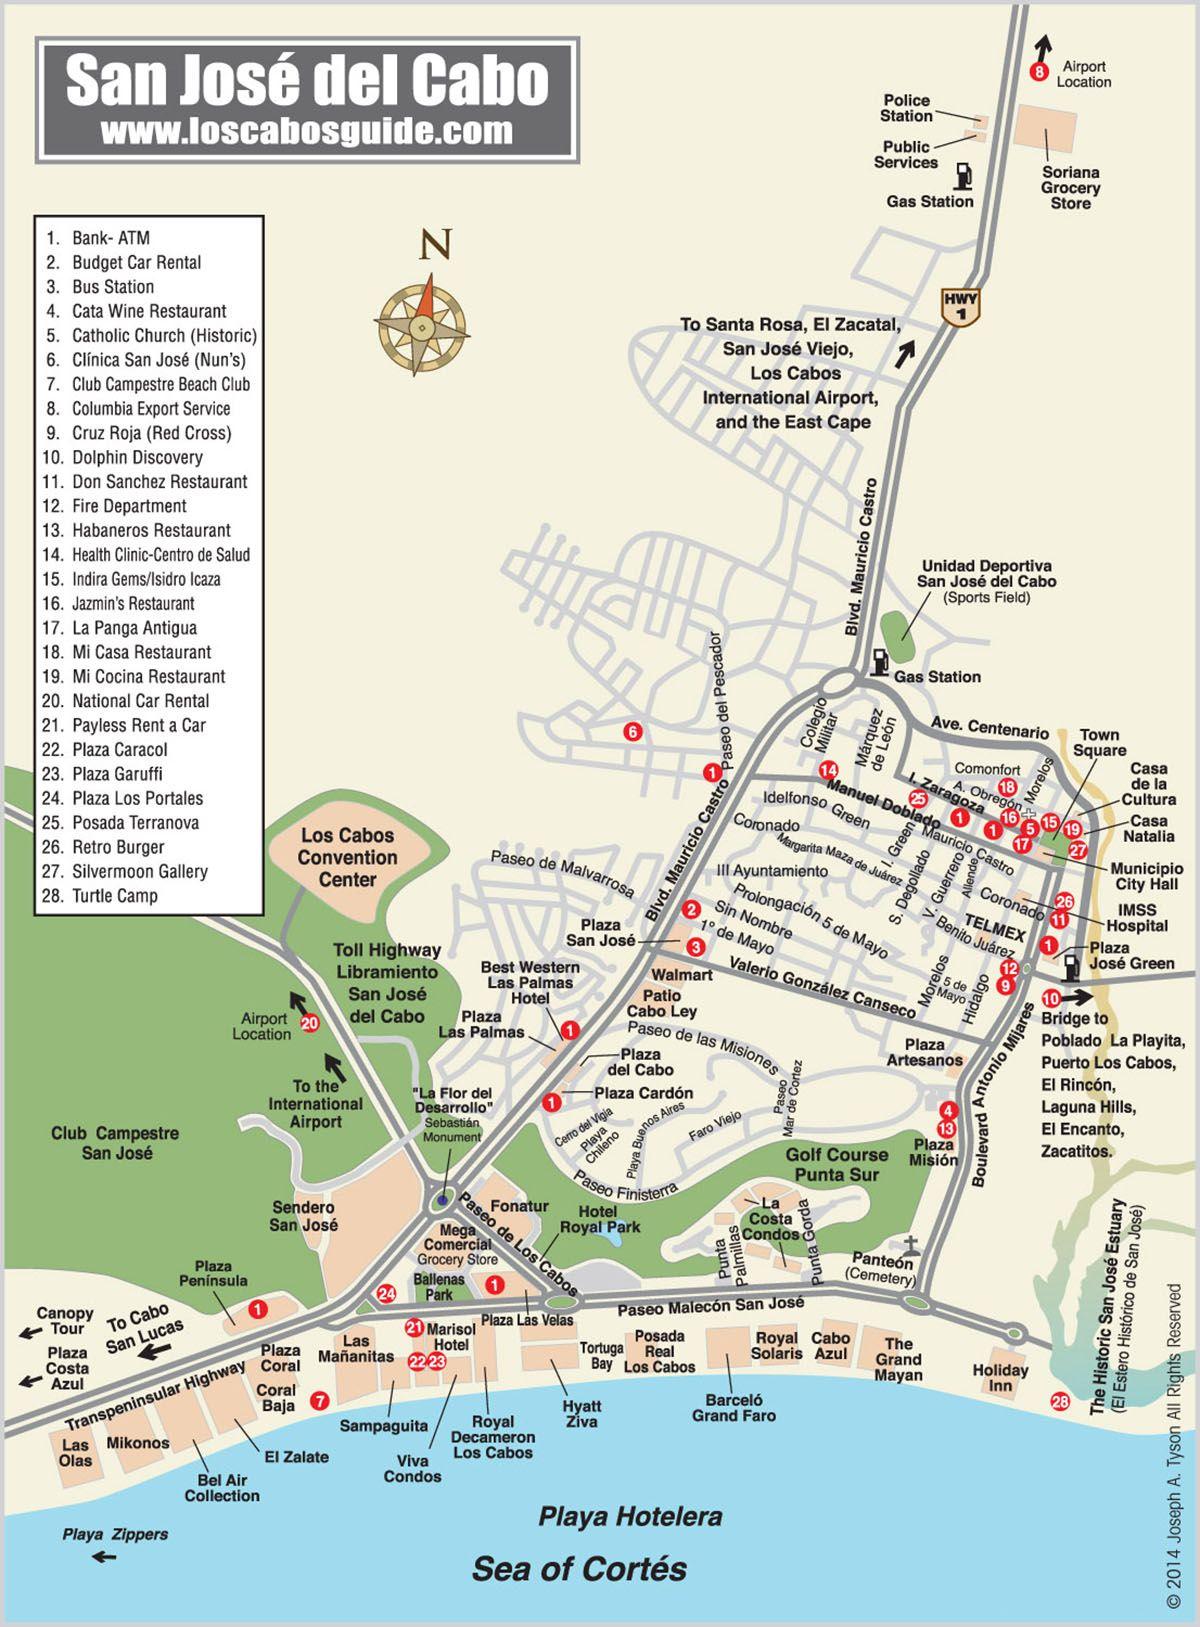 San Jose Del Cabo Mexico Map.San Jose Del Cabo Map Los Cabos Guide Travel Spots In 2019